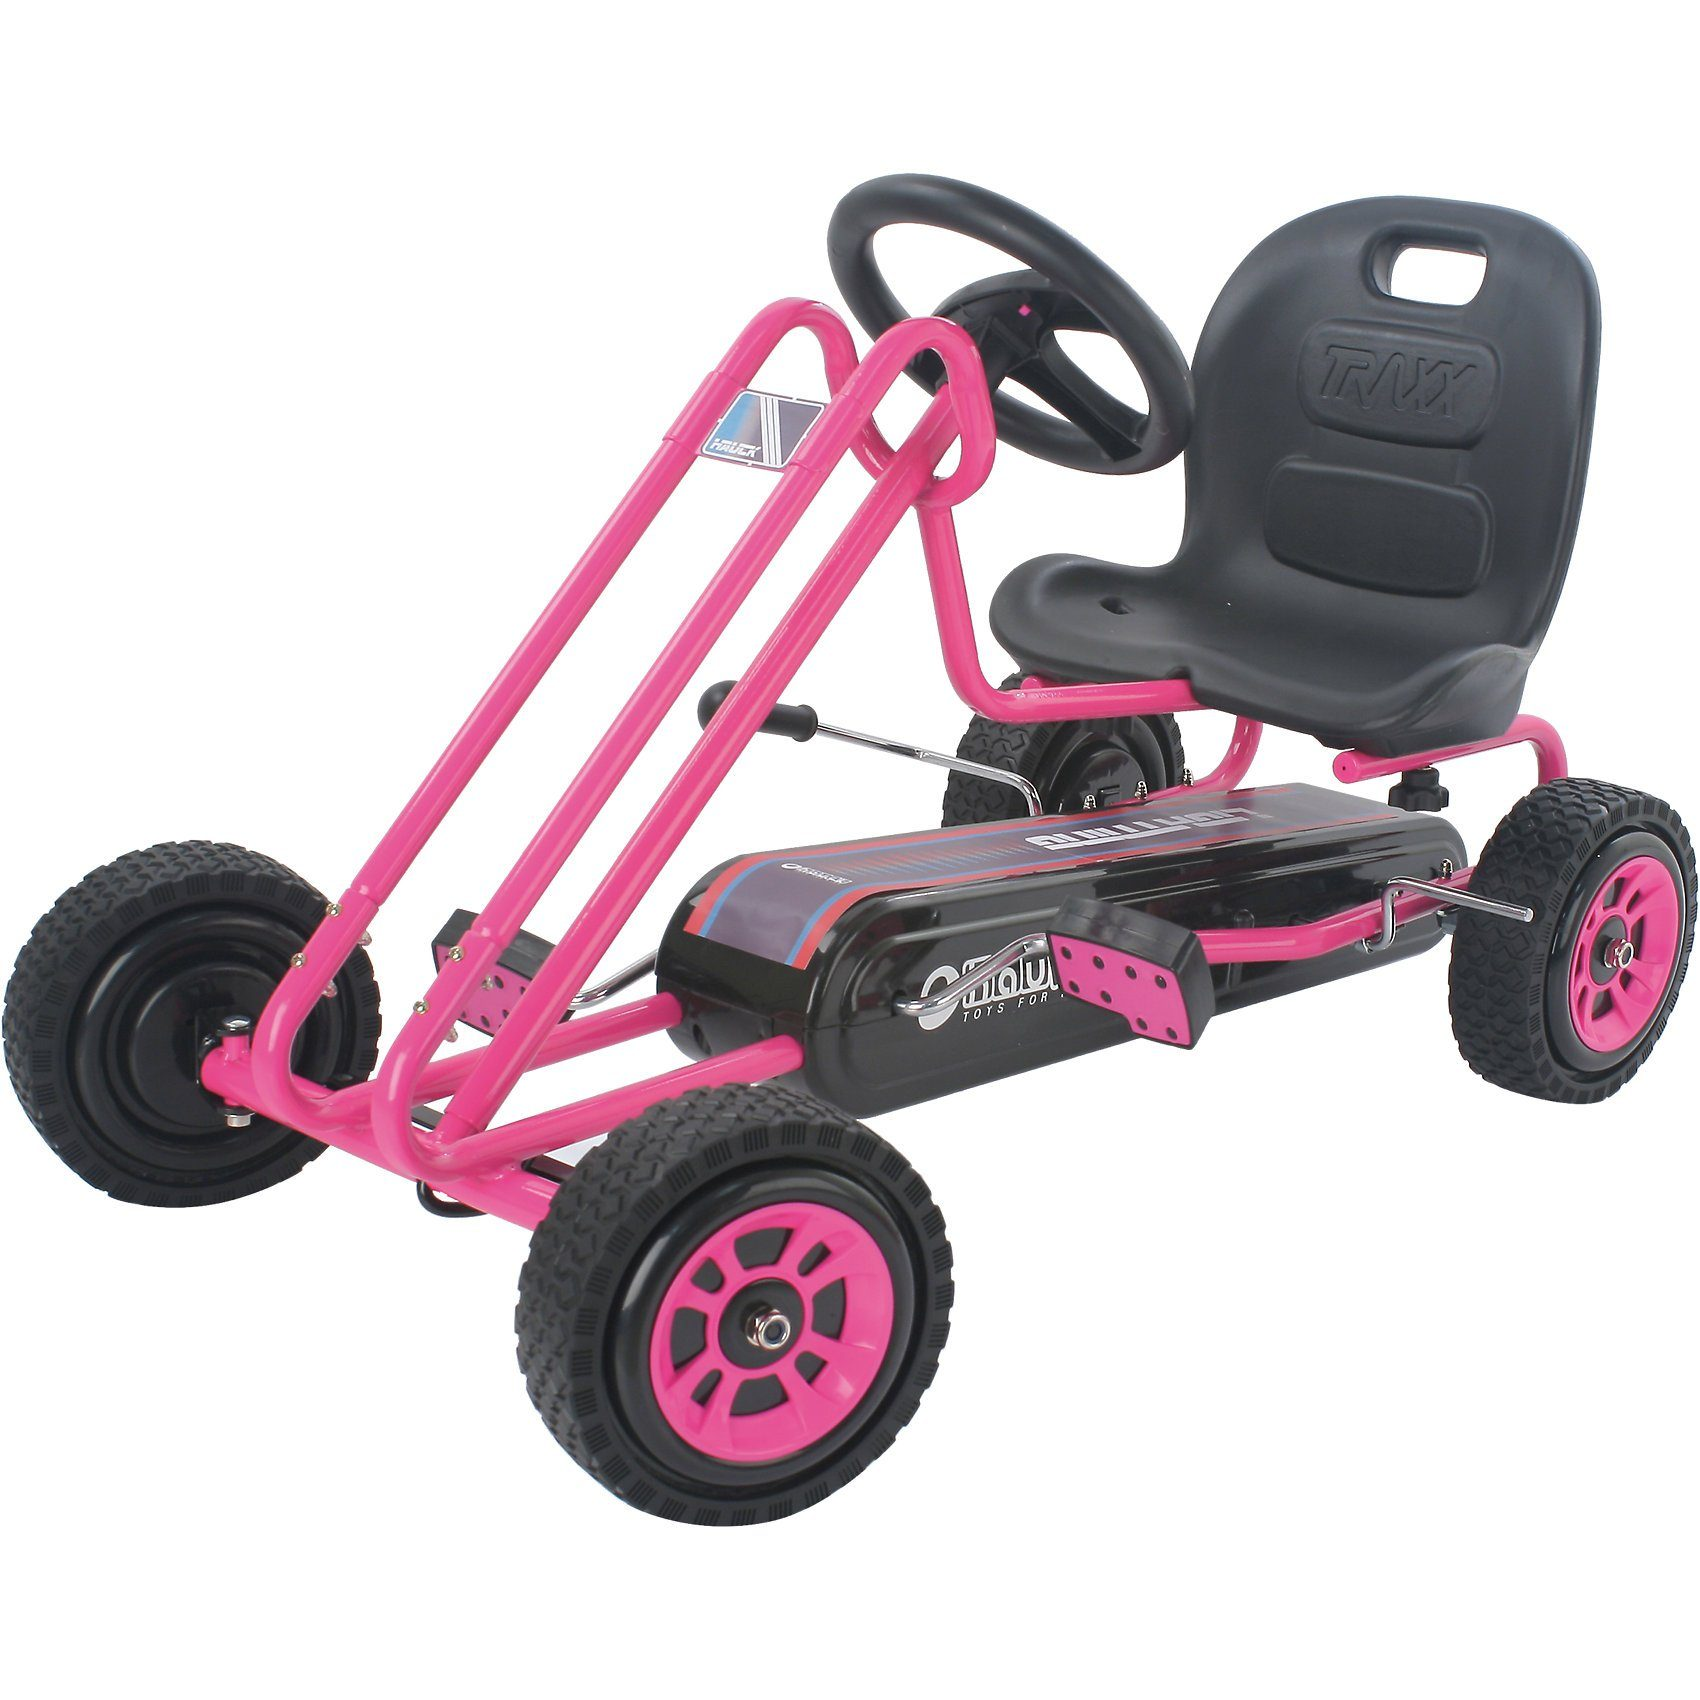 Go-Kart Lightning, pink